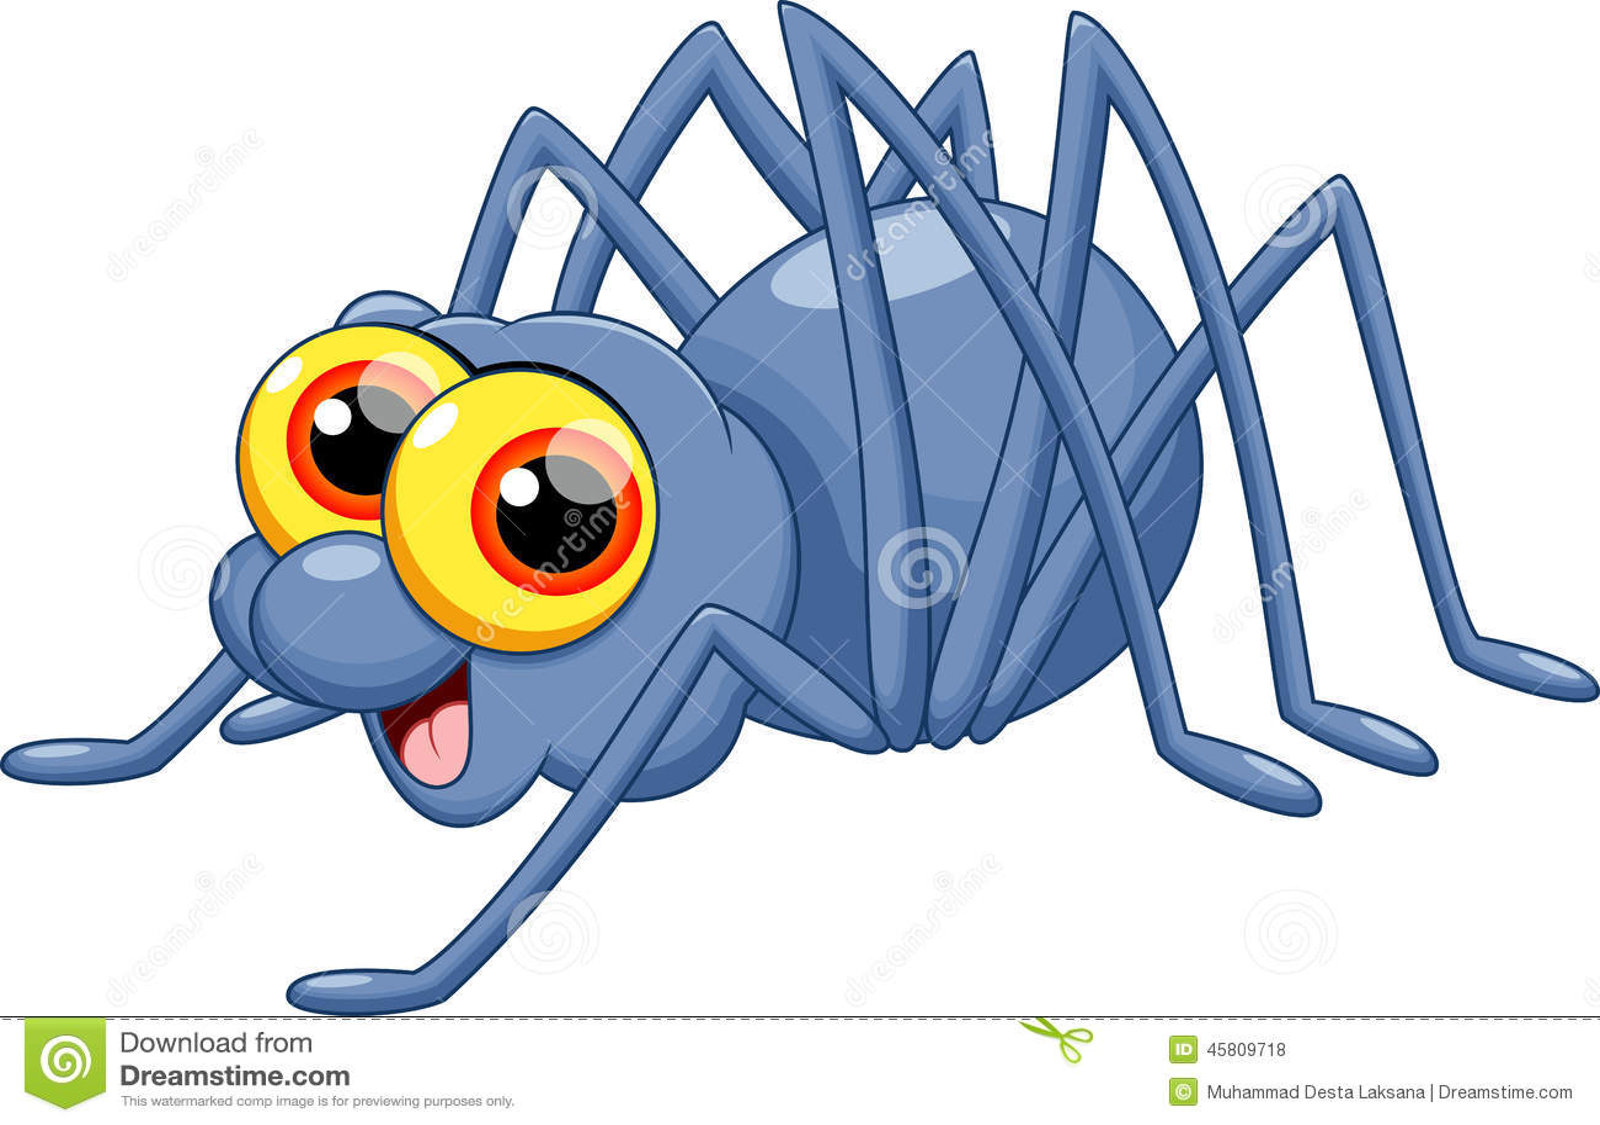 Cute Spider Cartoon Stock Illustration - Image: 45809718